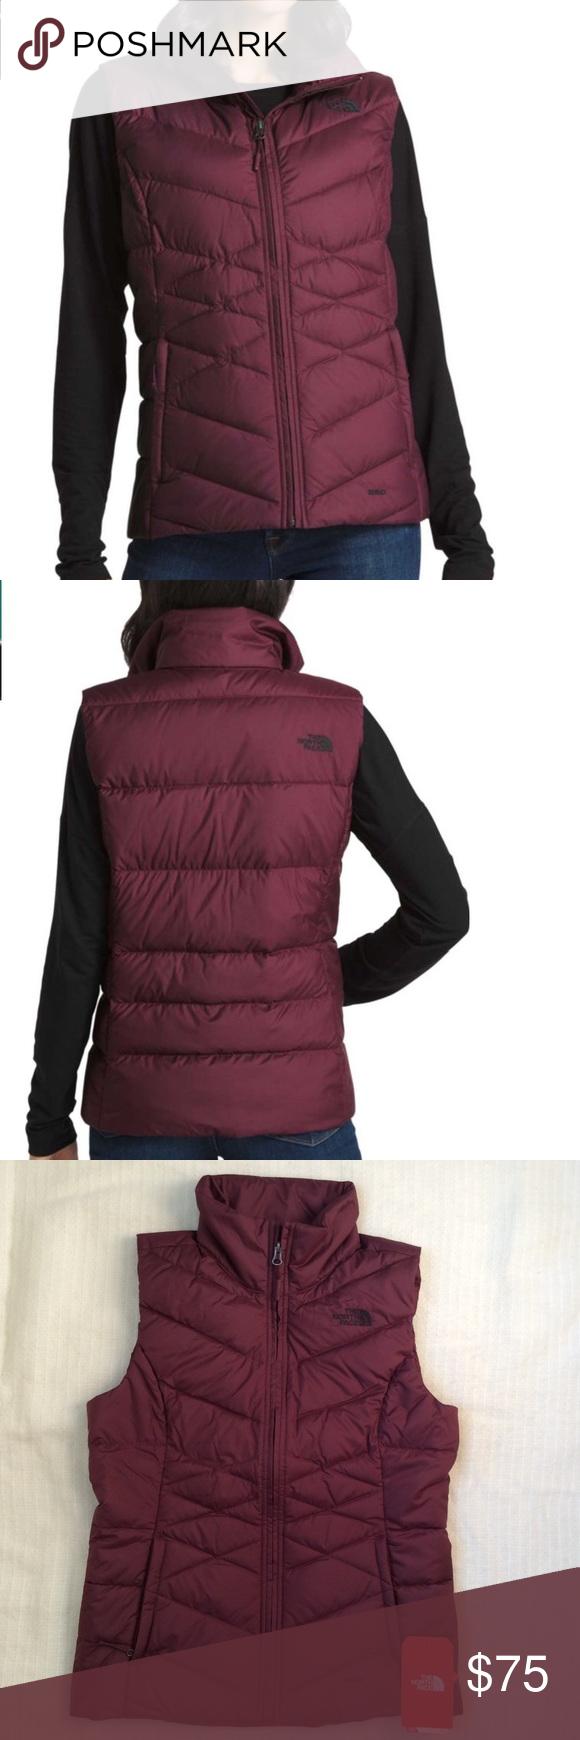 The North Face Alpz 550 Down Puffer Vest Small Fashion Clothes Design Fashion Trends [ 1740 x 580 Pixel ]